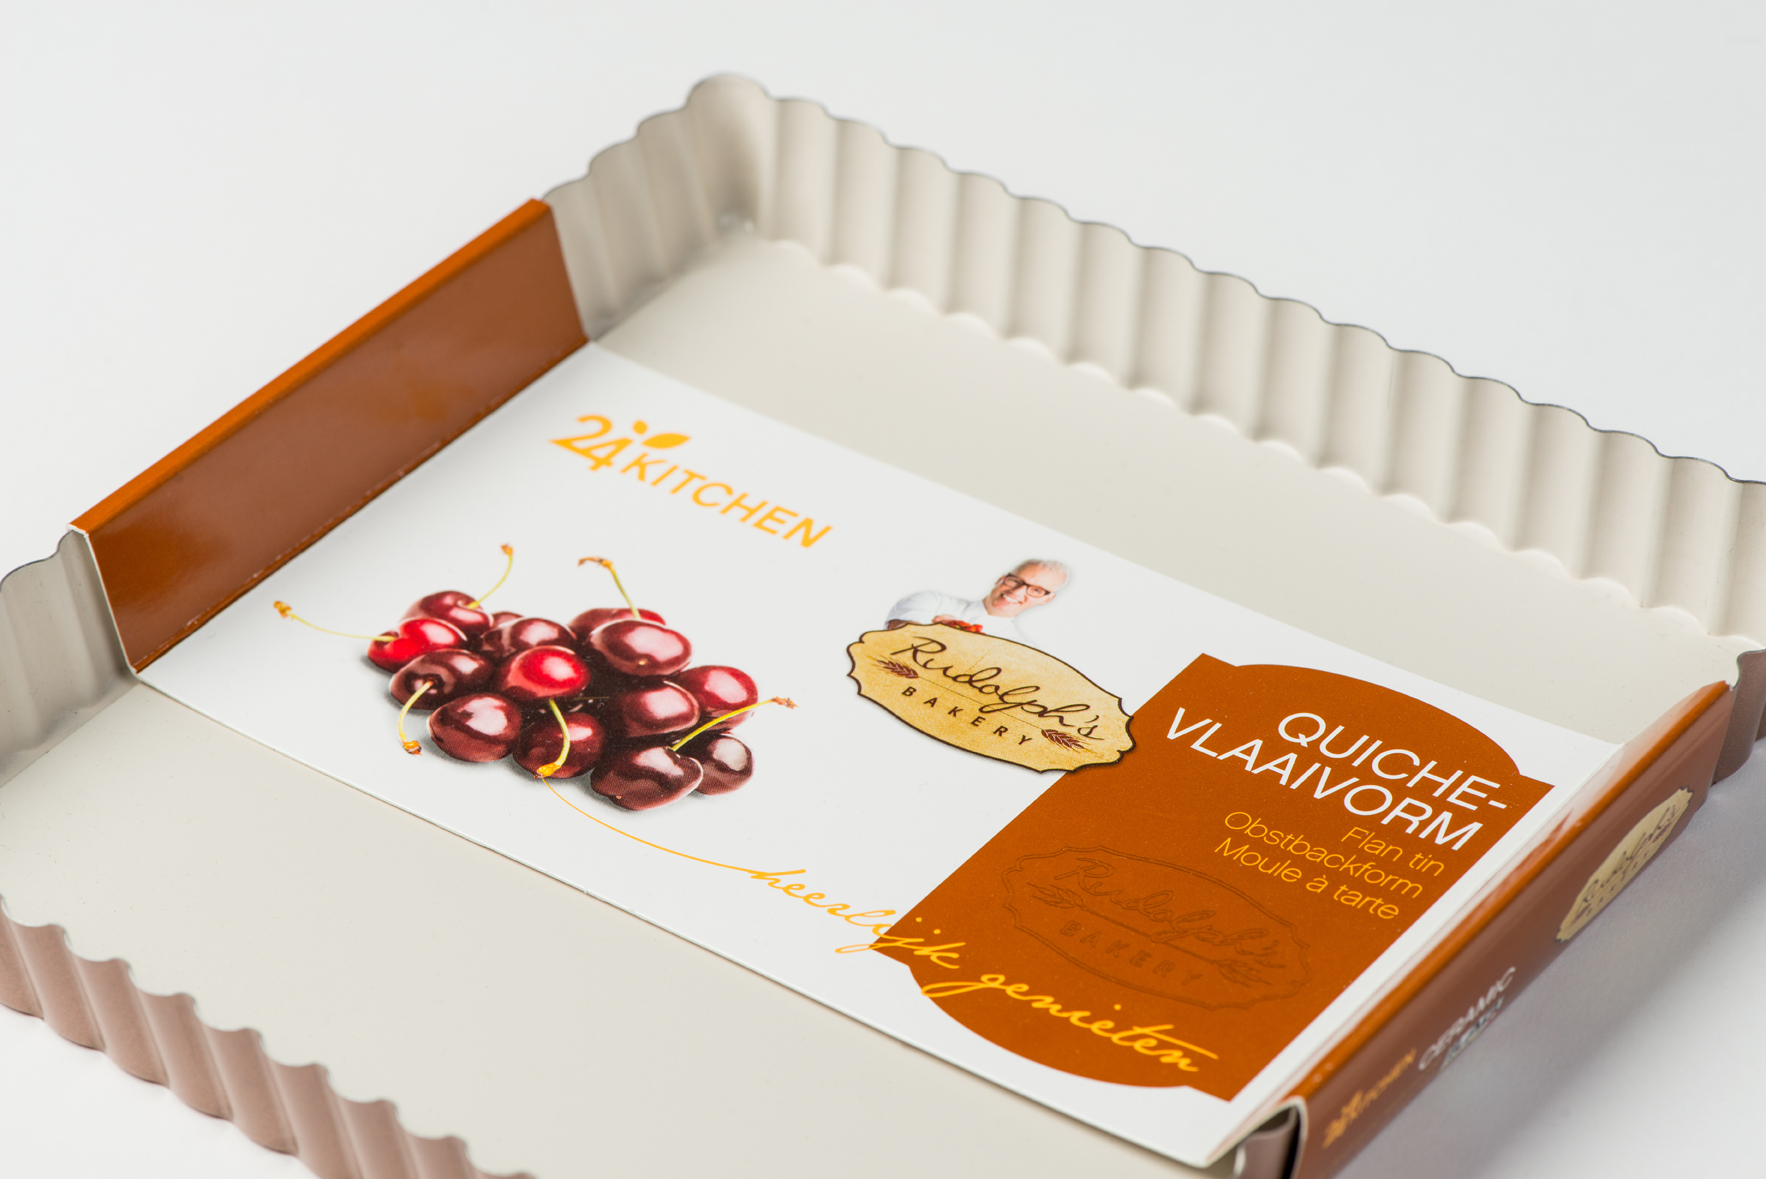 graphical-packaging-design-baking-tools-rudolphsbakery-blokker